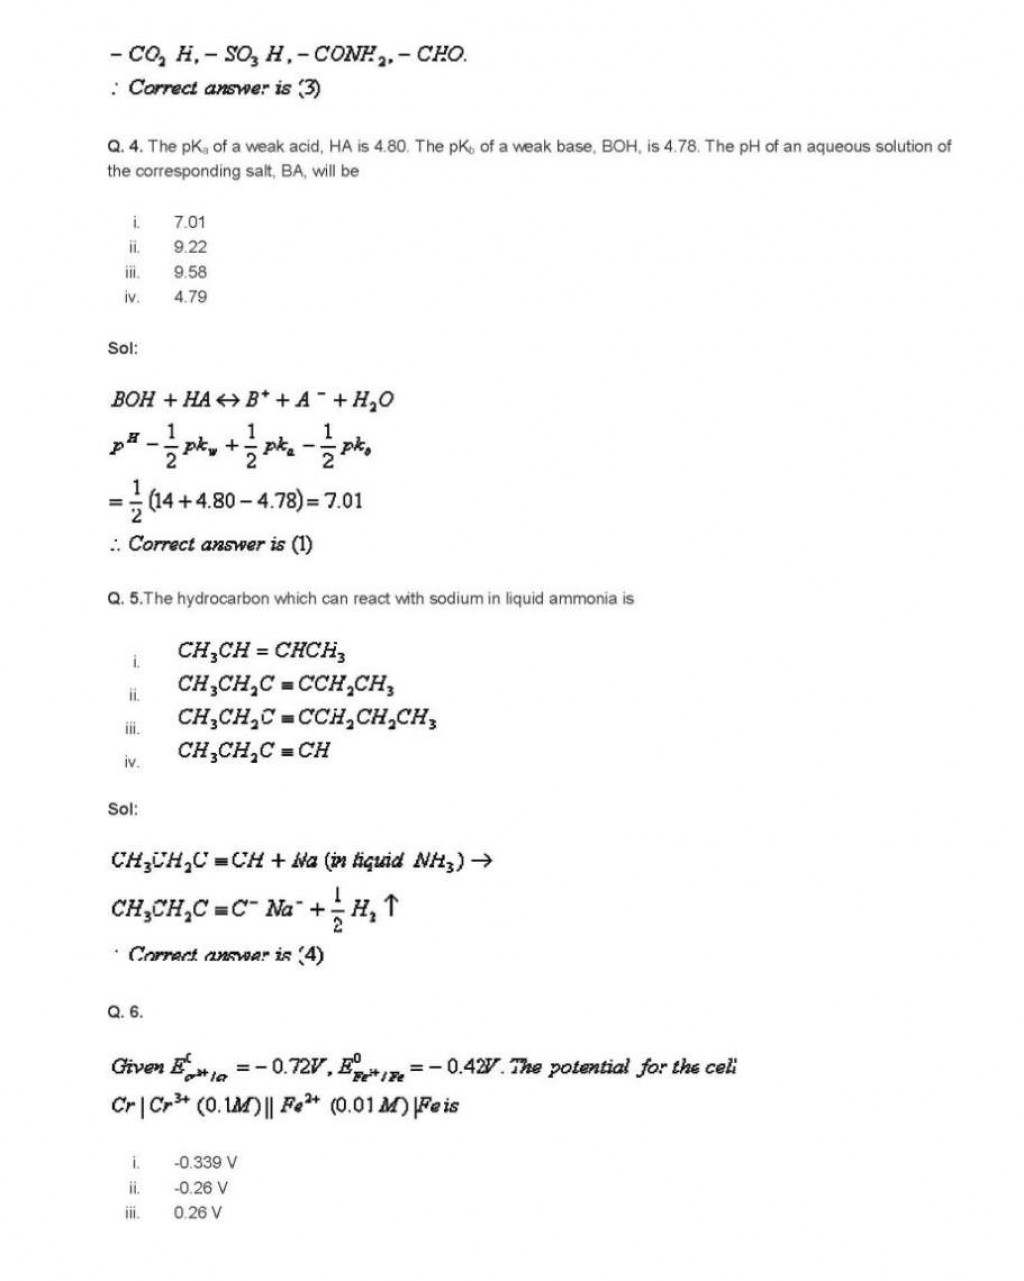 008 Essay Example Jamia Milia Tech Entrance Exam Question Paper Shocking Mentorship Mentoring Contoh Large